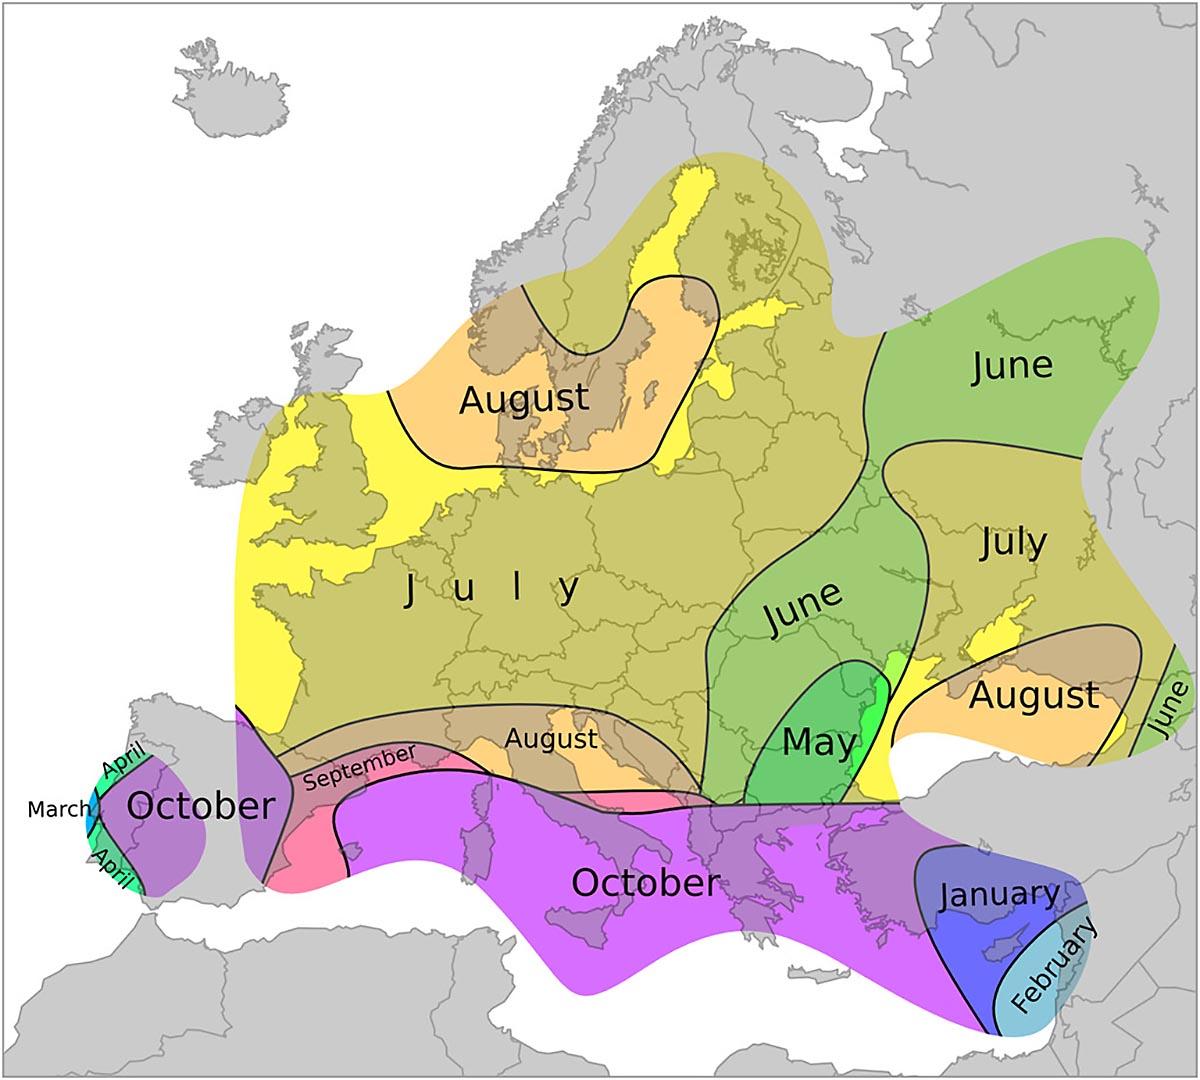 europe-severe-weather-tornado-hodonin-czech-republic-annual-activity